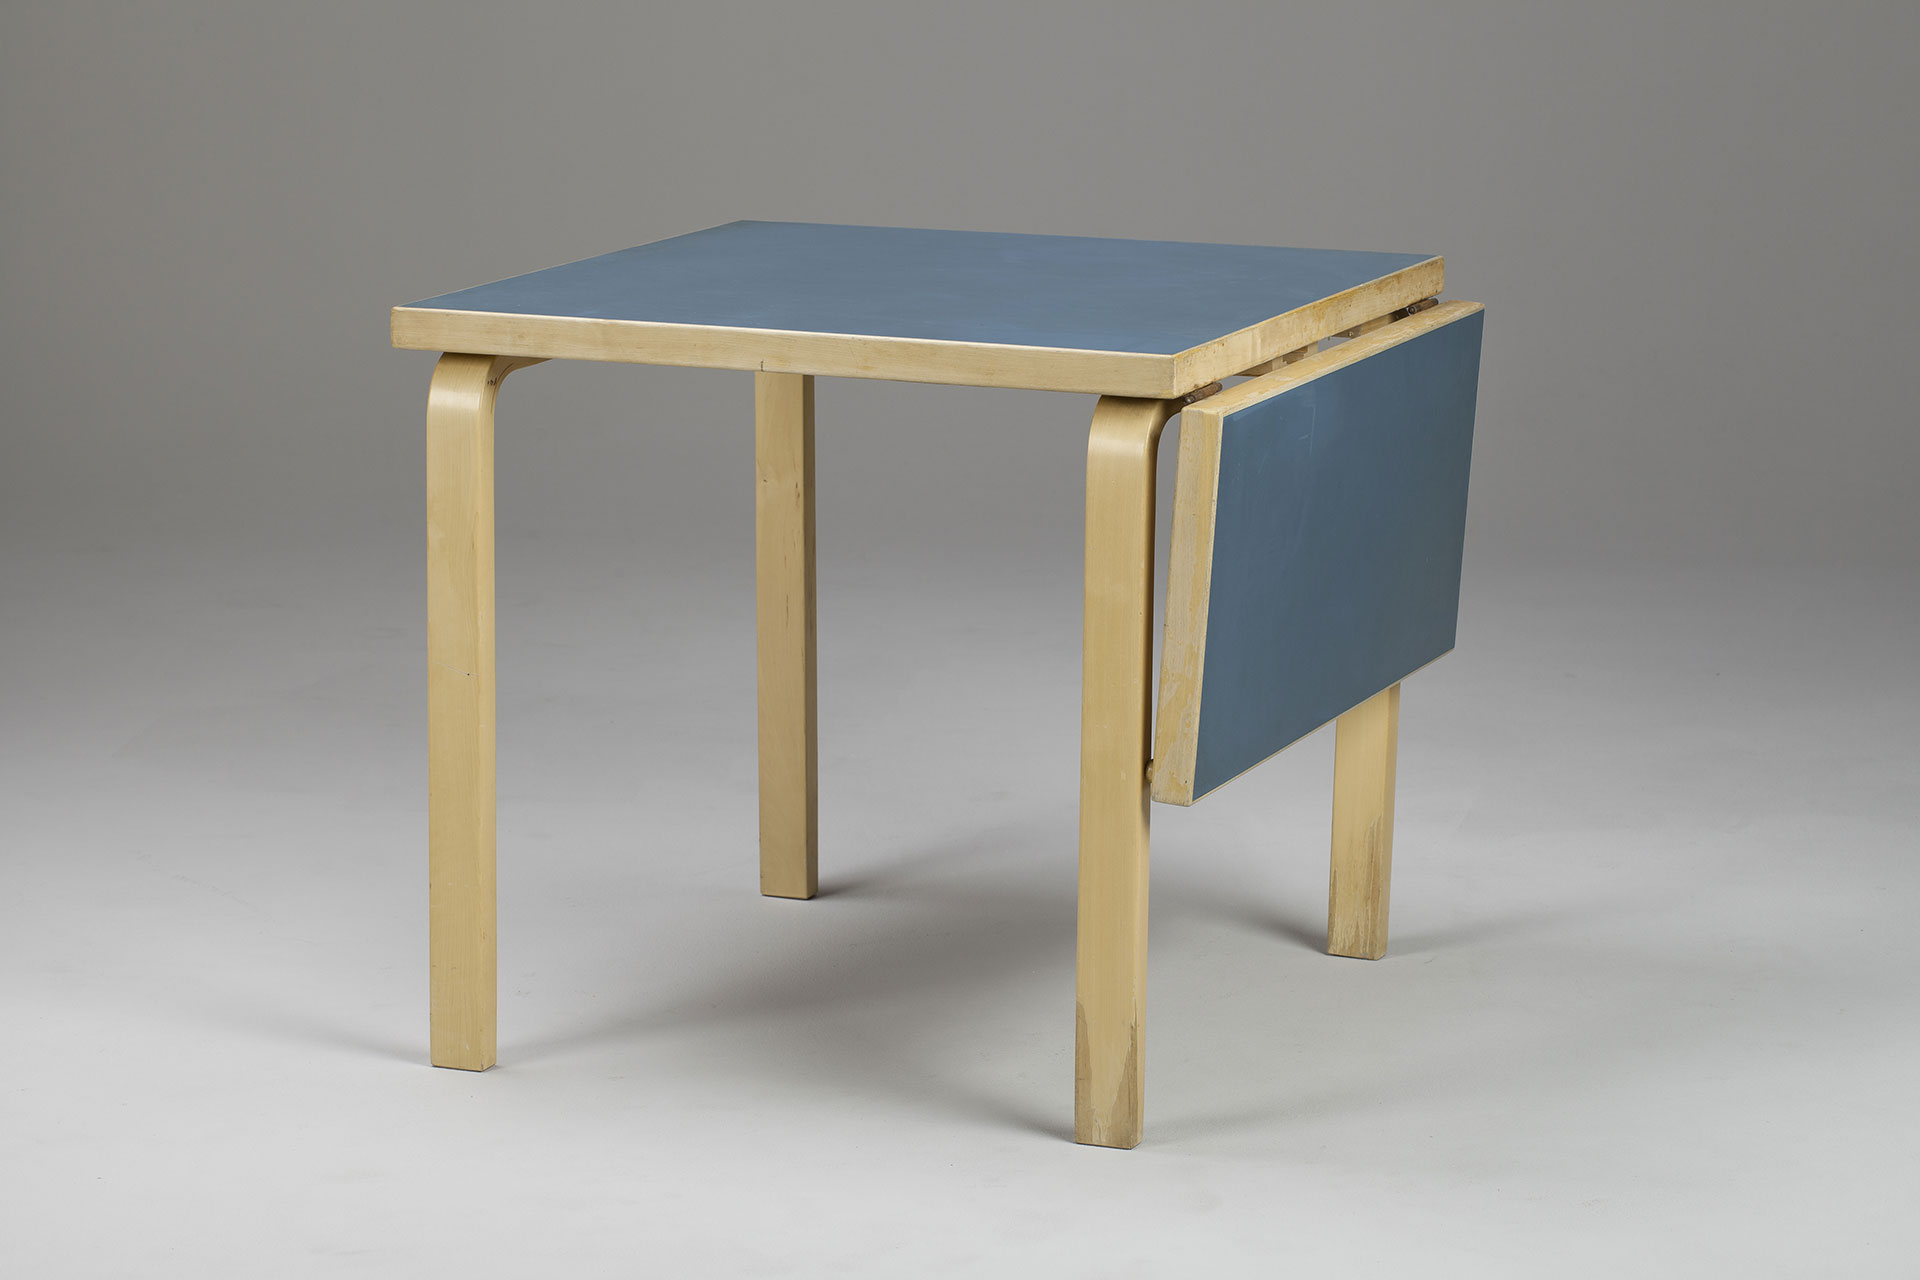 jacksons table alvar aalto. Black Bedroom Furniture Sets. Home Design Ideas